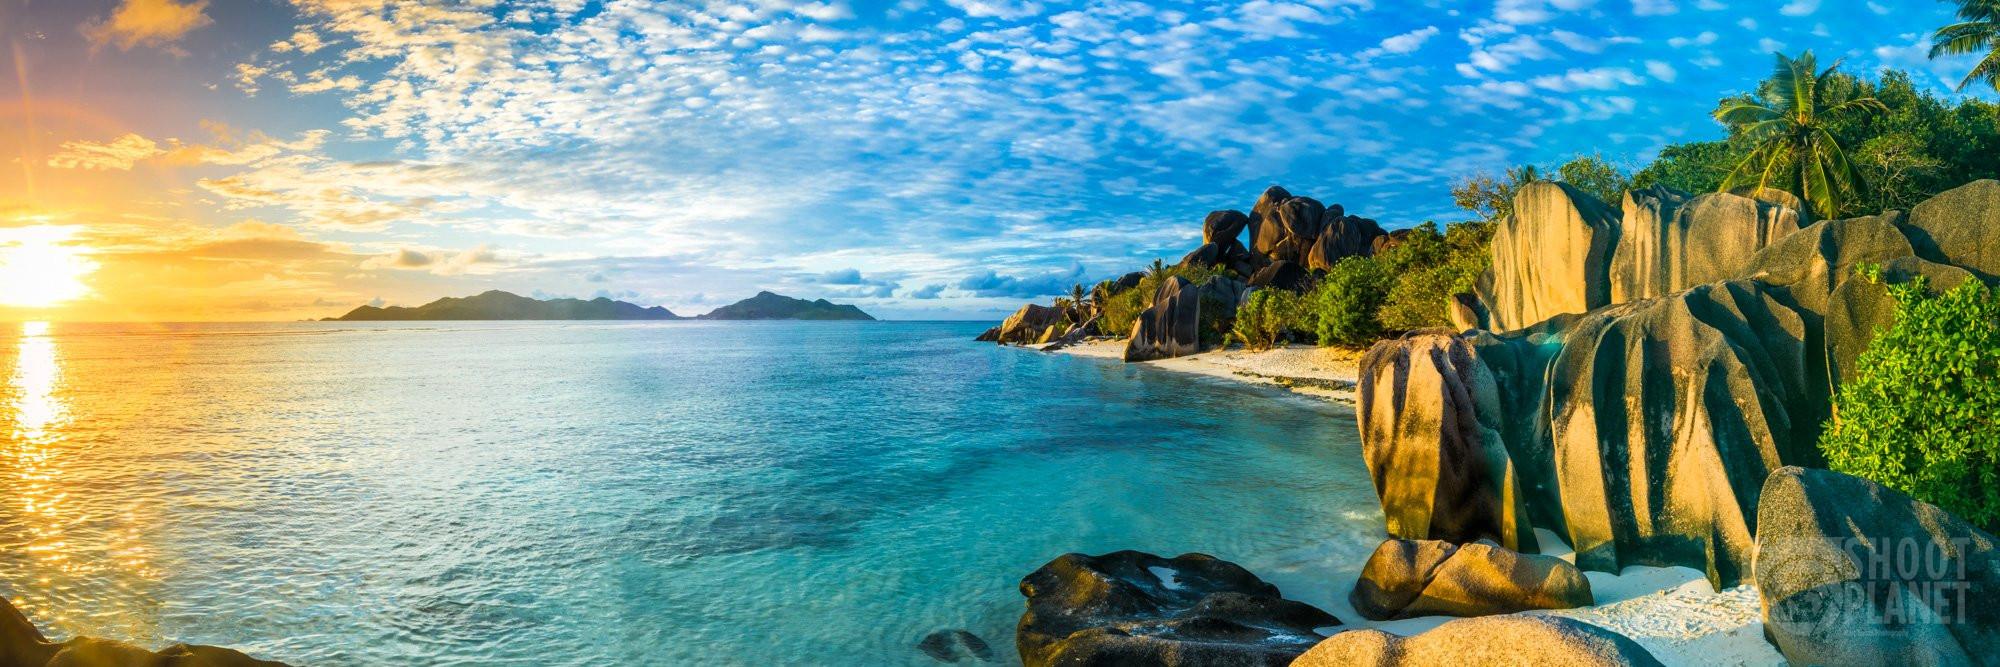 Granite rock beach sunset, La Digue, Seychelles